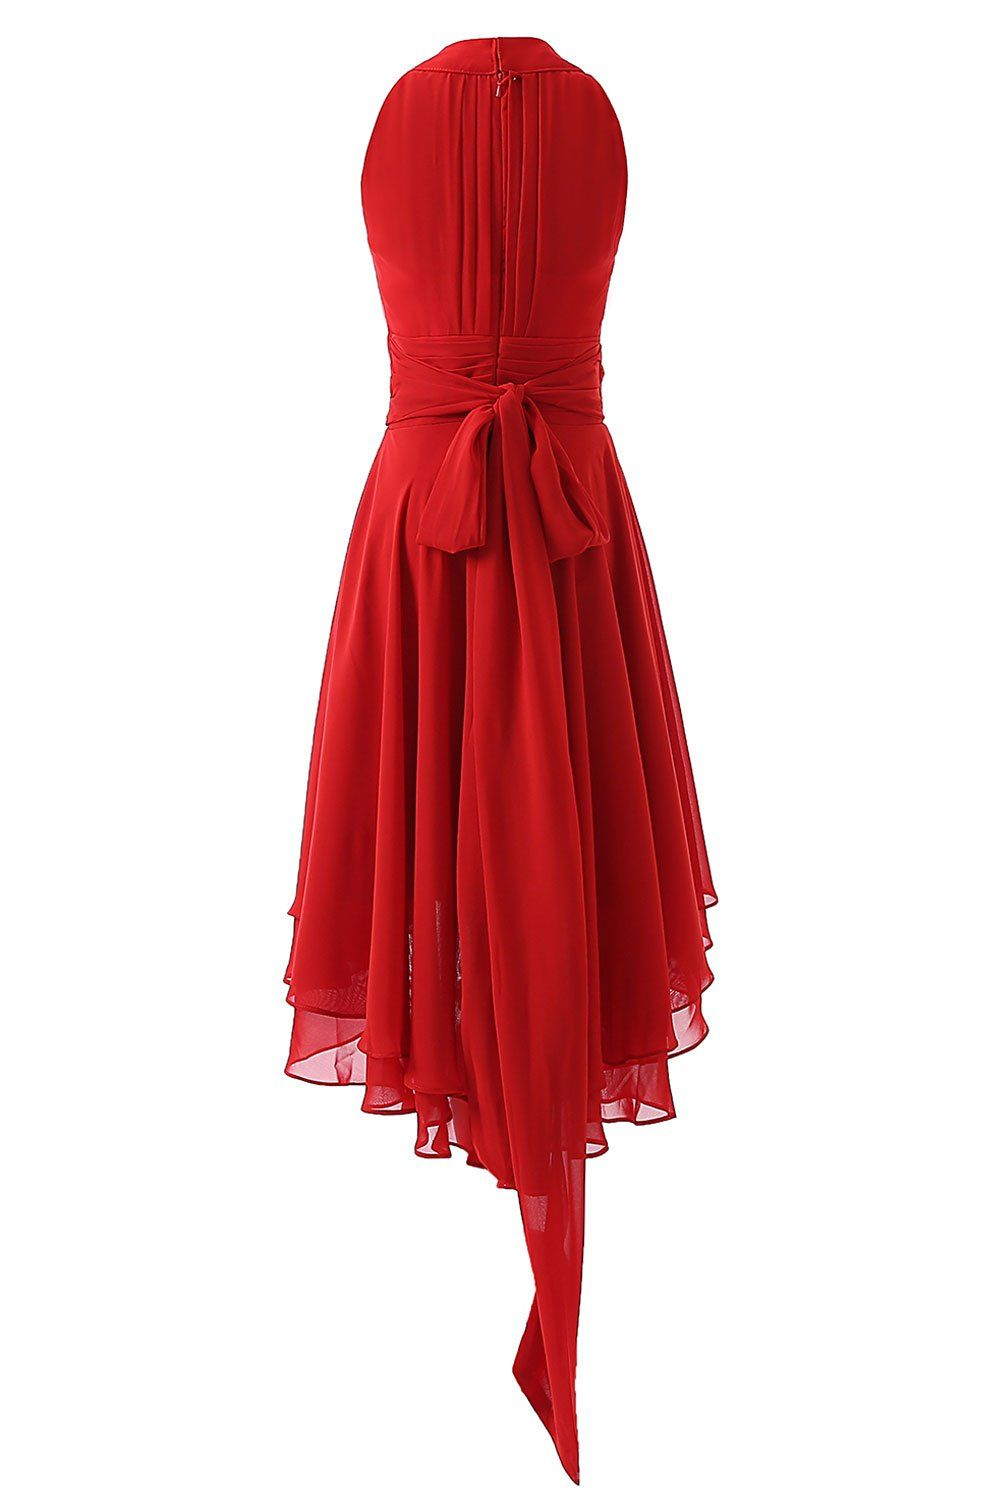 DYS Womens Short Bridesmaid Dresses Hi Lo Prom Homecoming Dress